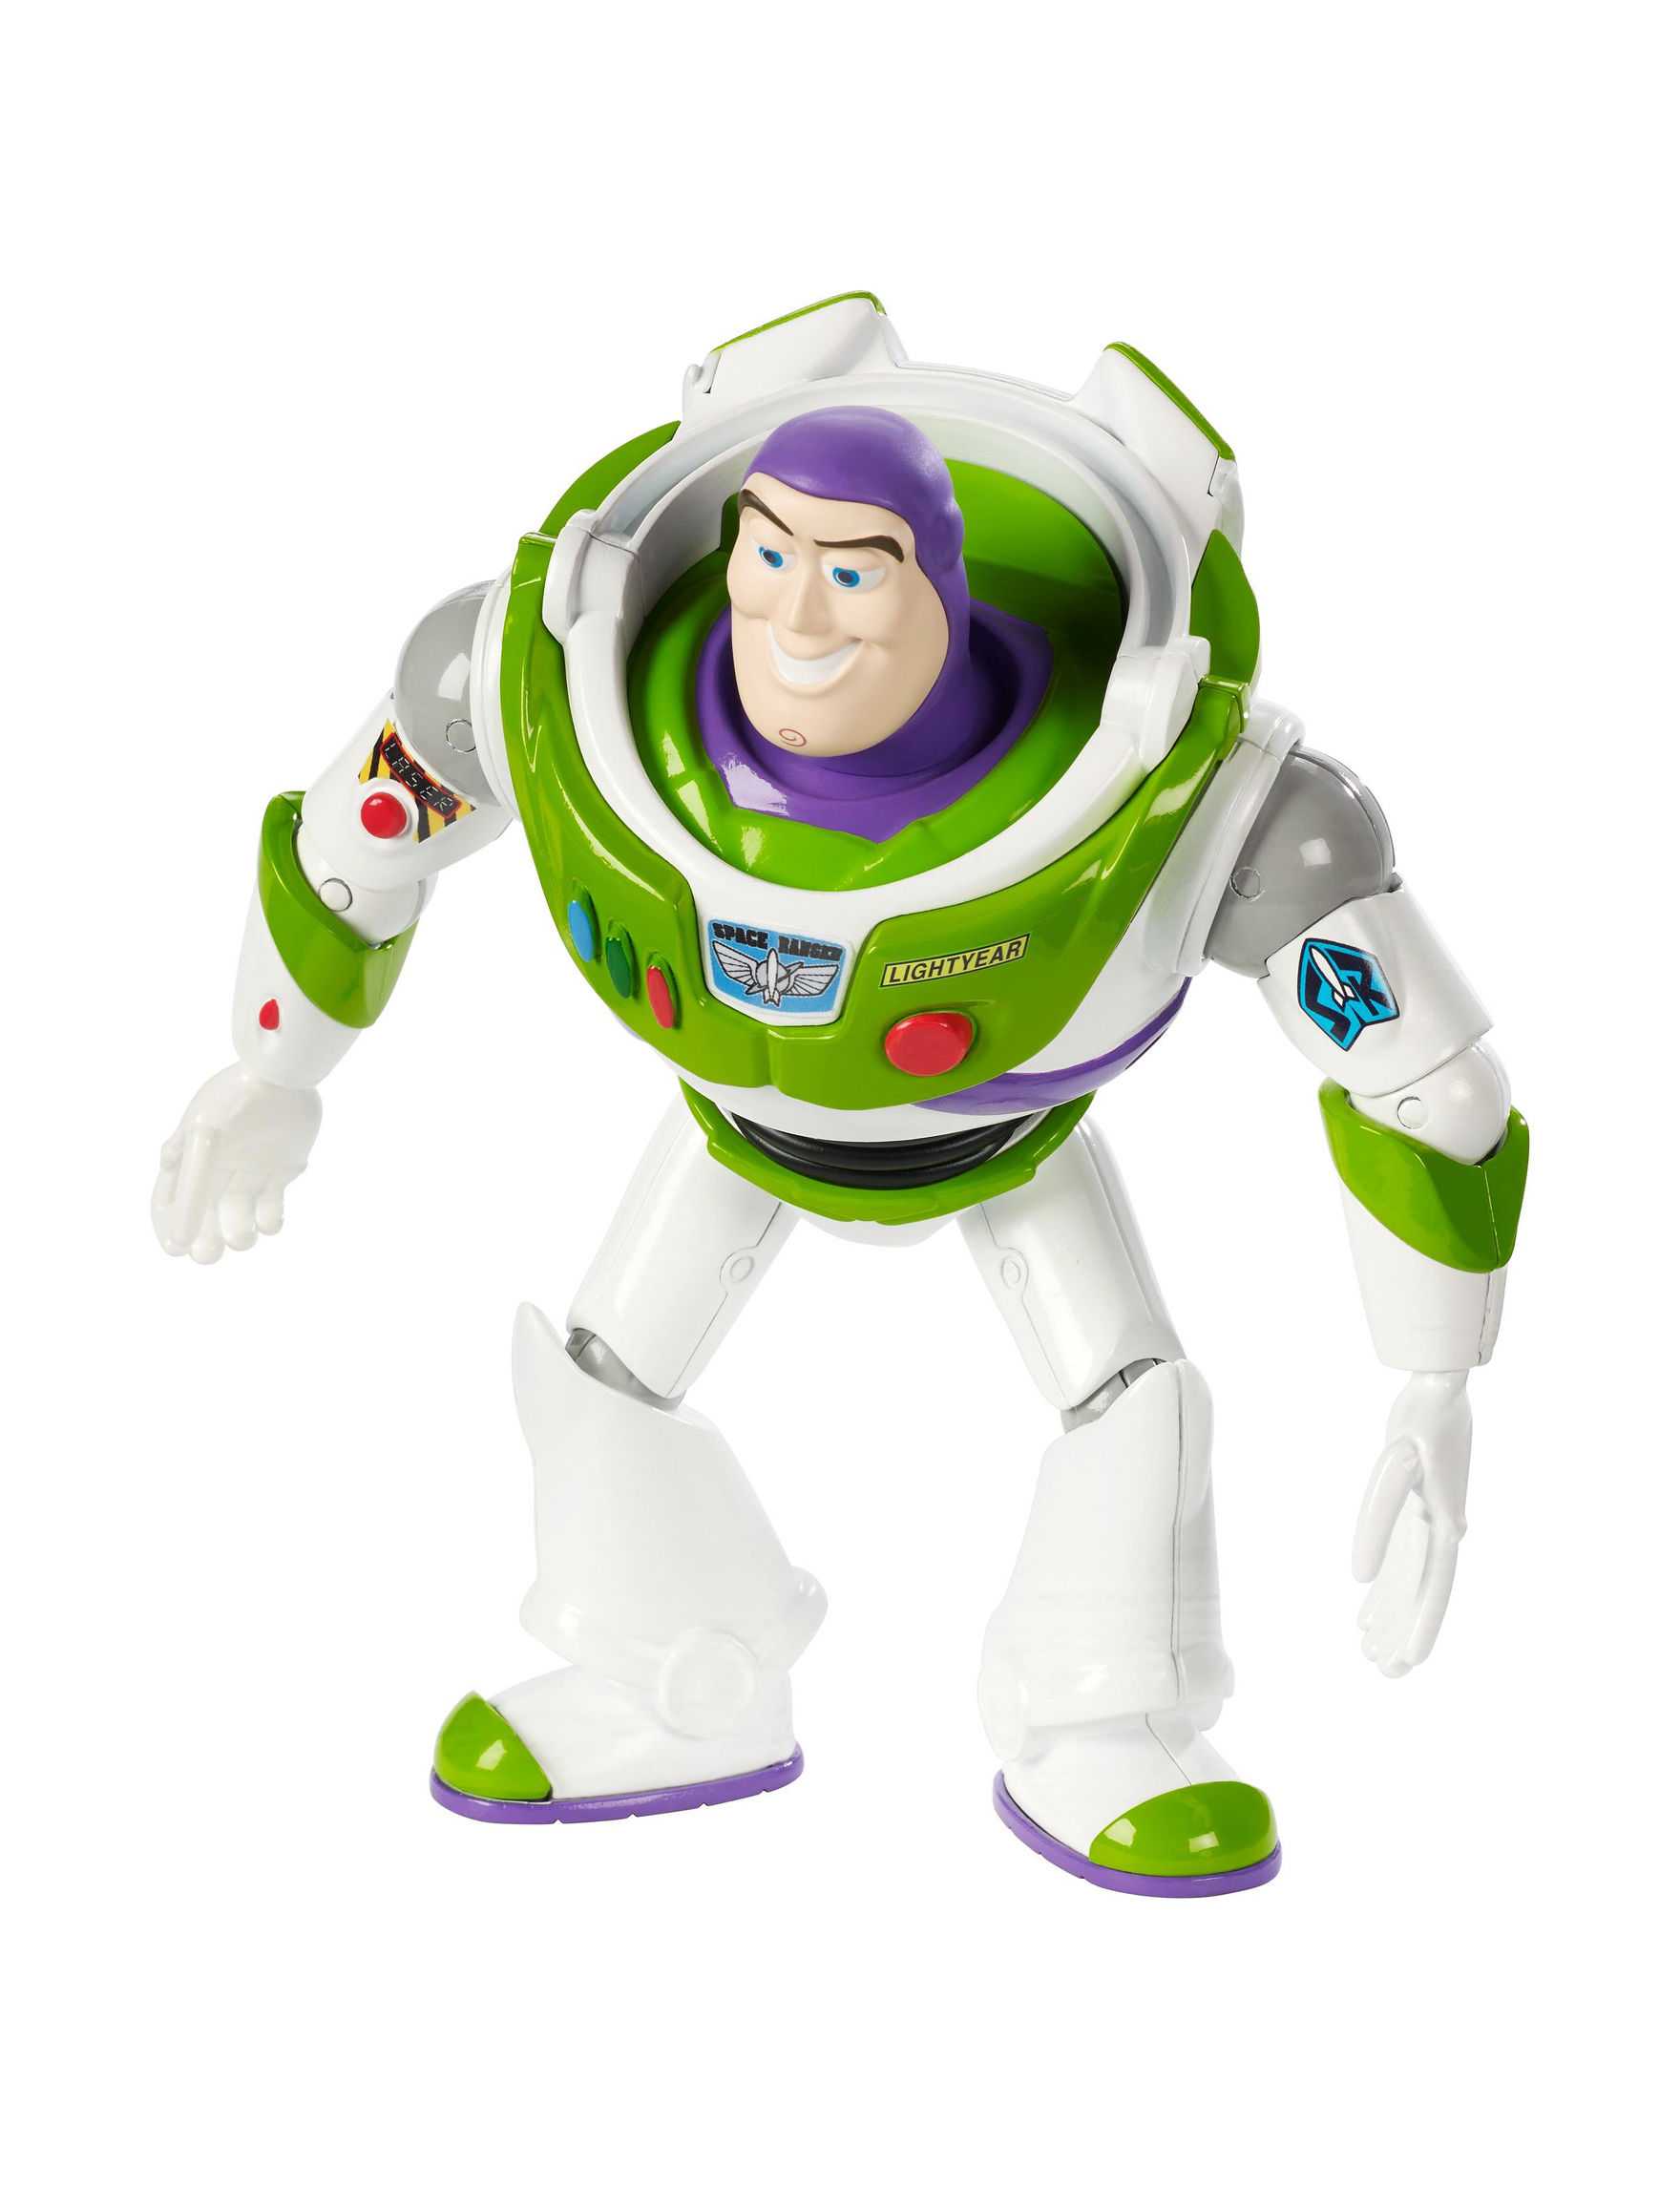 Toy Story White / Multi